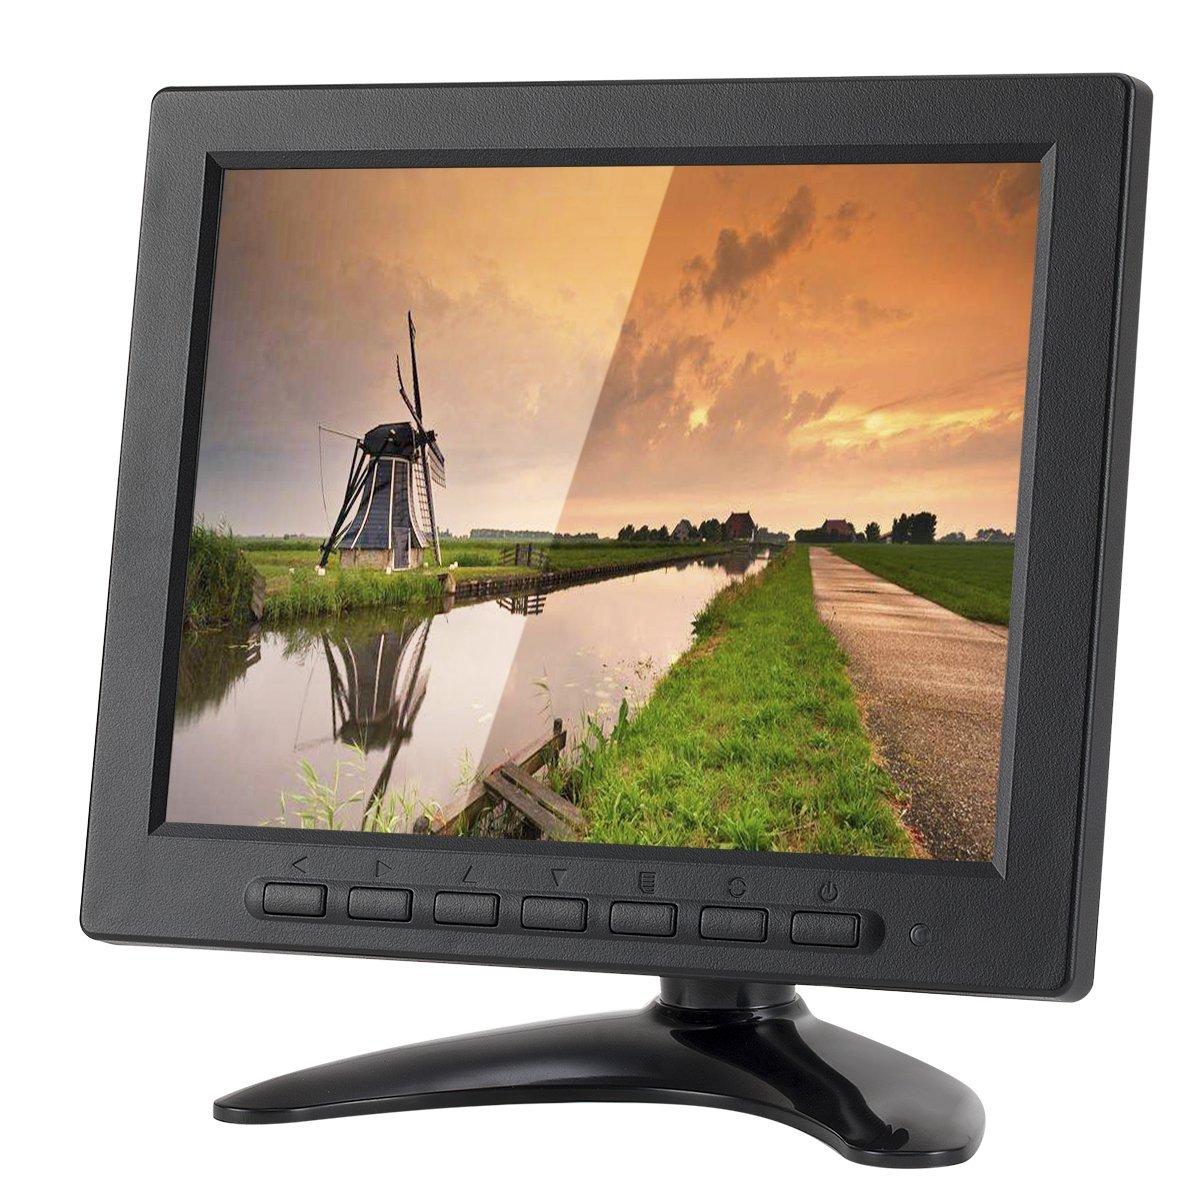 LSLYA 8 inch TFT LED Monitor 1024x768 Resolution Display Portable 4:3 IPS HD Color Video Screen Support USB AV BNC HDMI VGA BNC Input PC CCTV Raspberry Pi (8'' LED 1024x768 160°)